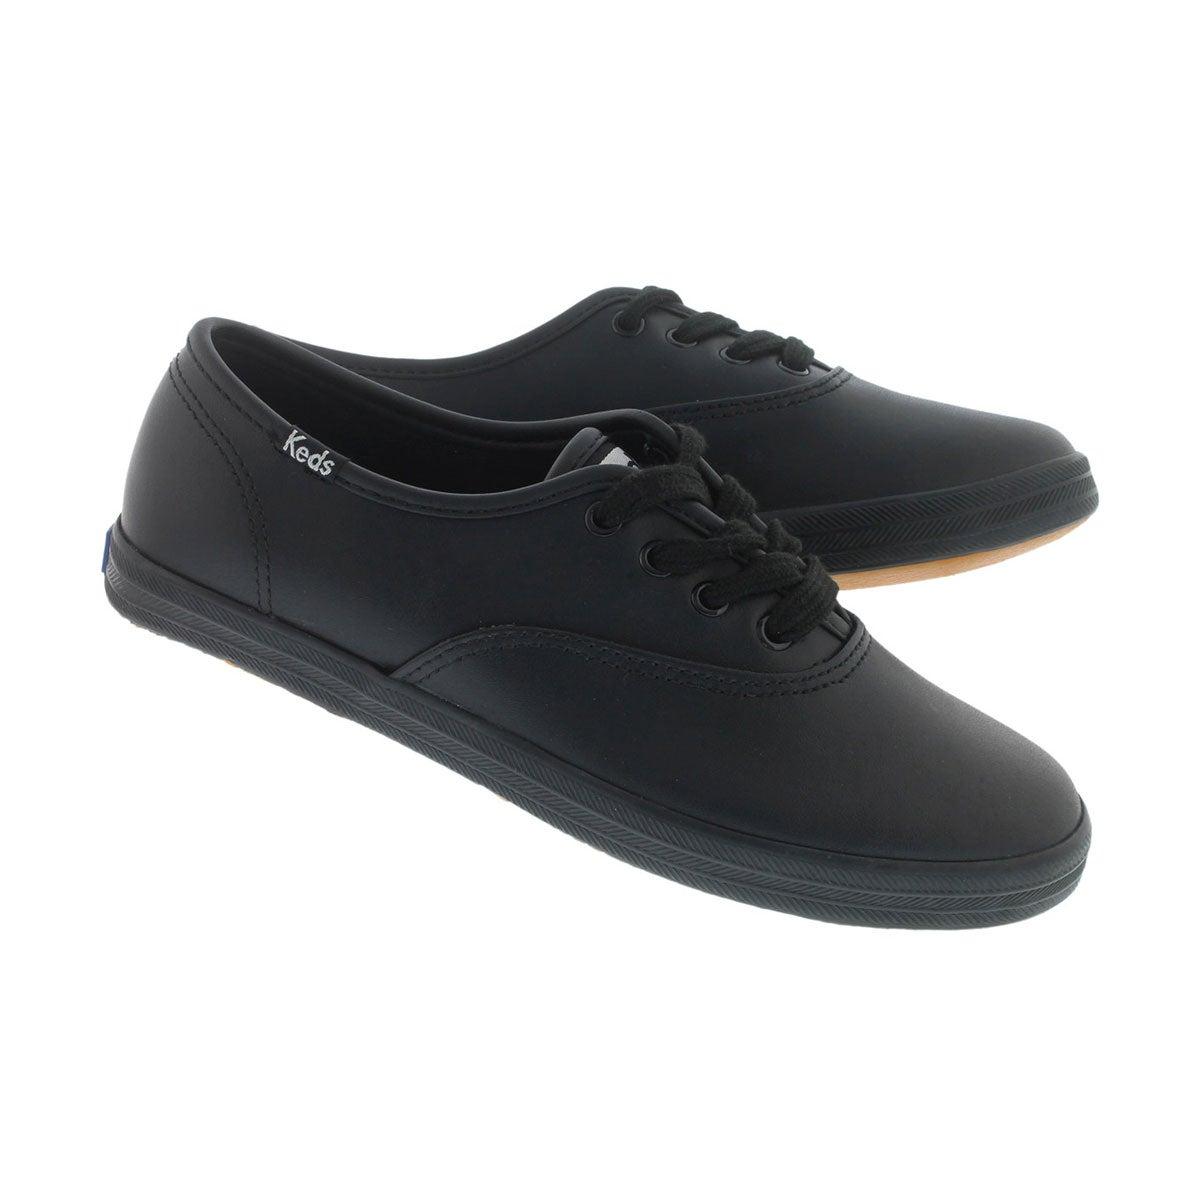 Girls' Champion black leather sneaker